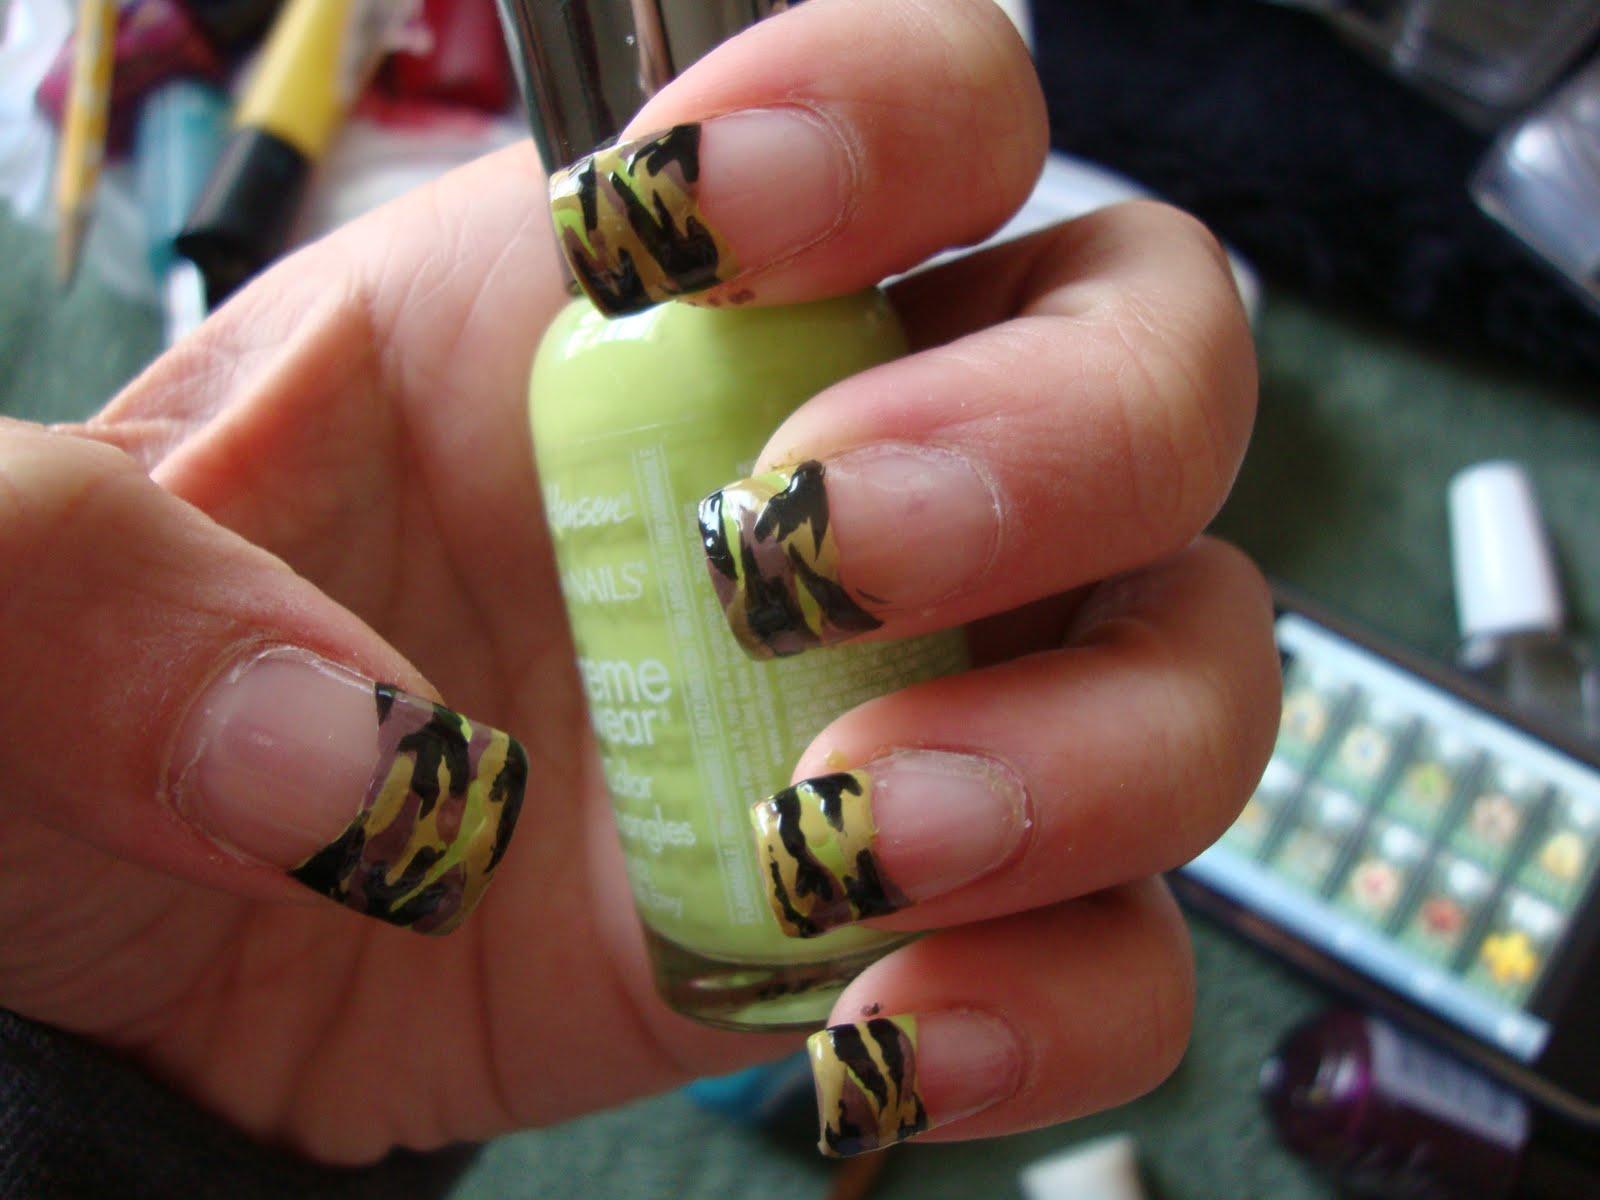 Realtree camo acrylic nail tips nails gallery realtree camo acrylic nail tips pictures prinsesfo Image collections